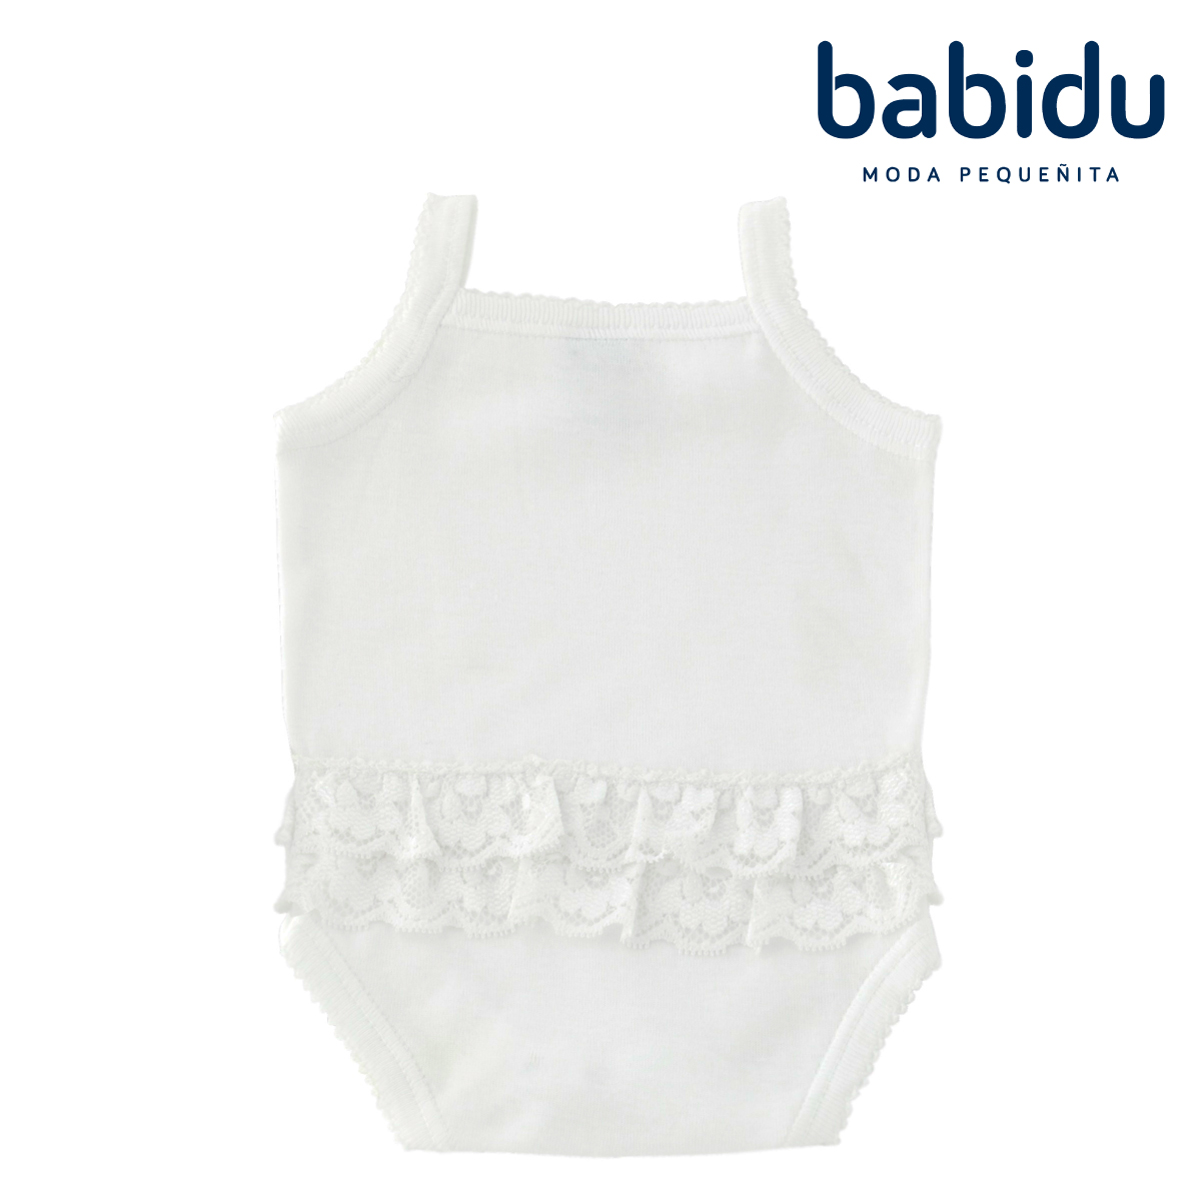 80613b508feea 人気のおしりフリルシリーズです☆Babidu バビドゥ ベビー服 おしりフリル キャミソール ボディ 綿100%